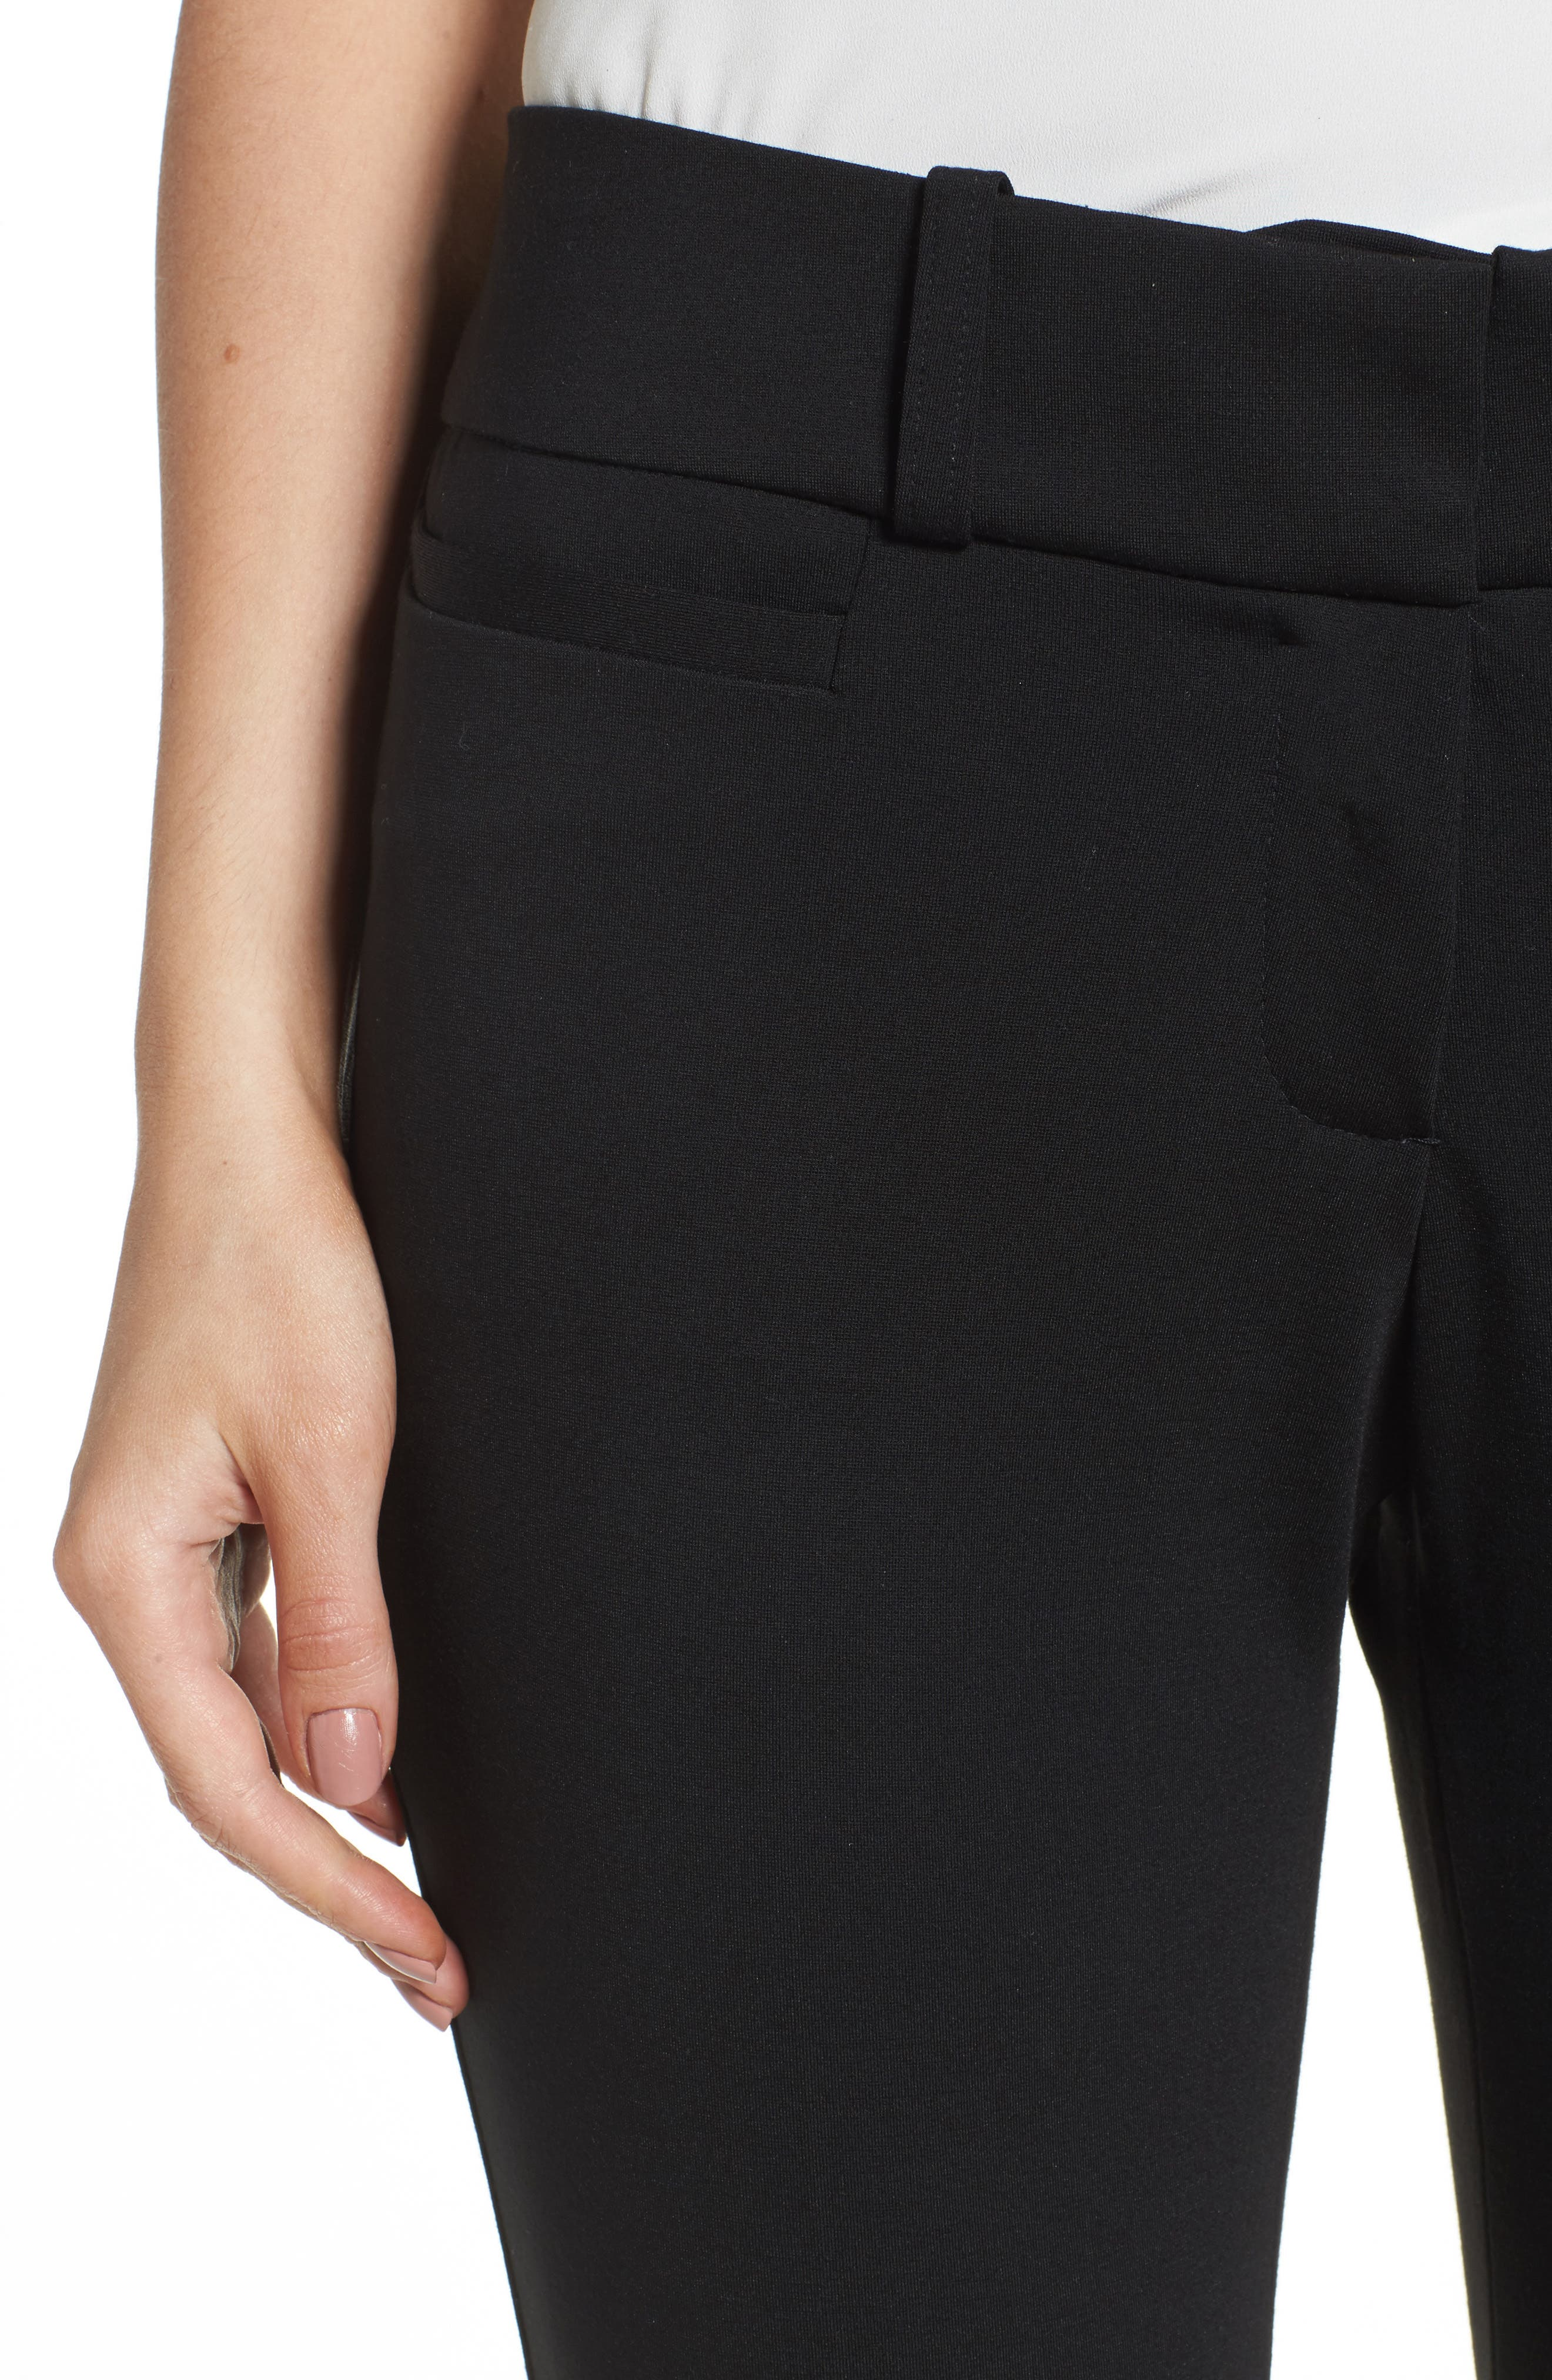 Jane Brown Trousers,                             Alternate thumbnail 4, color,                             001